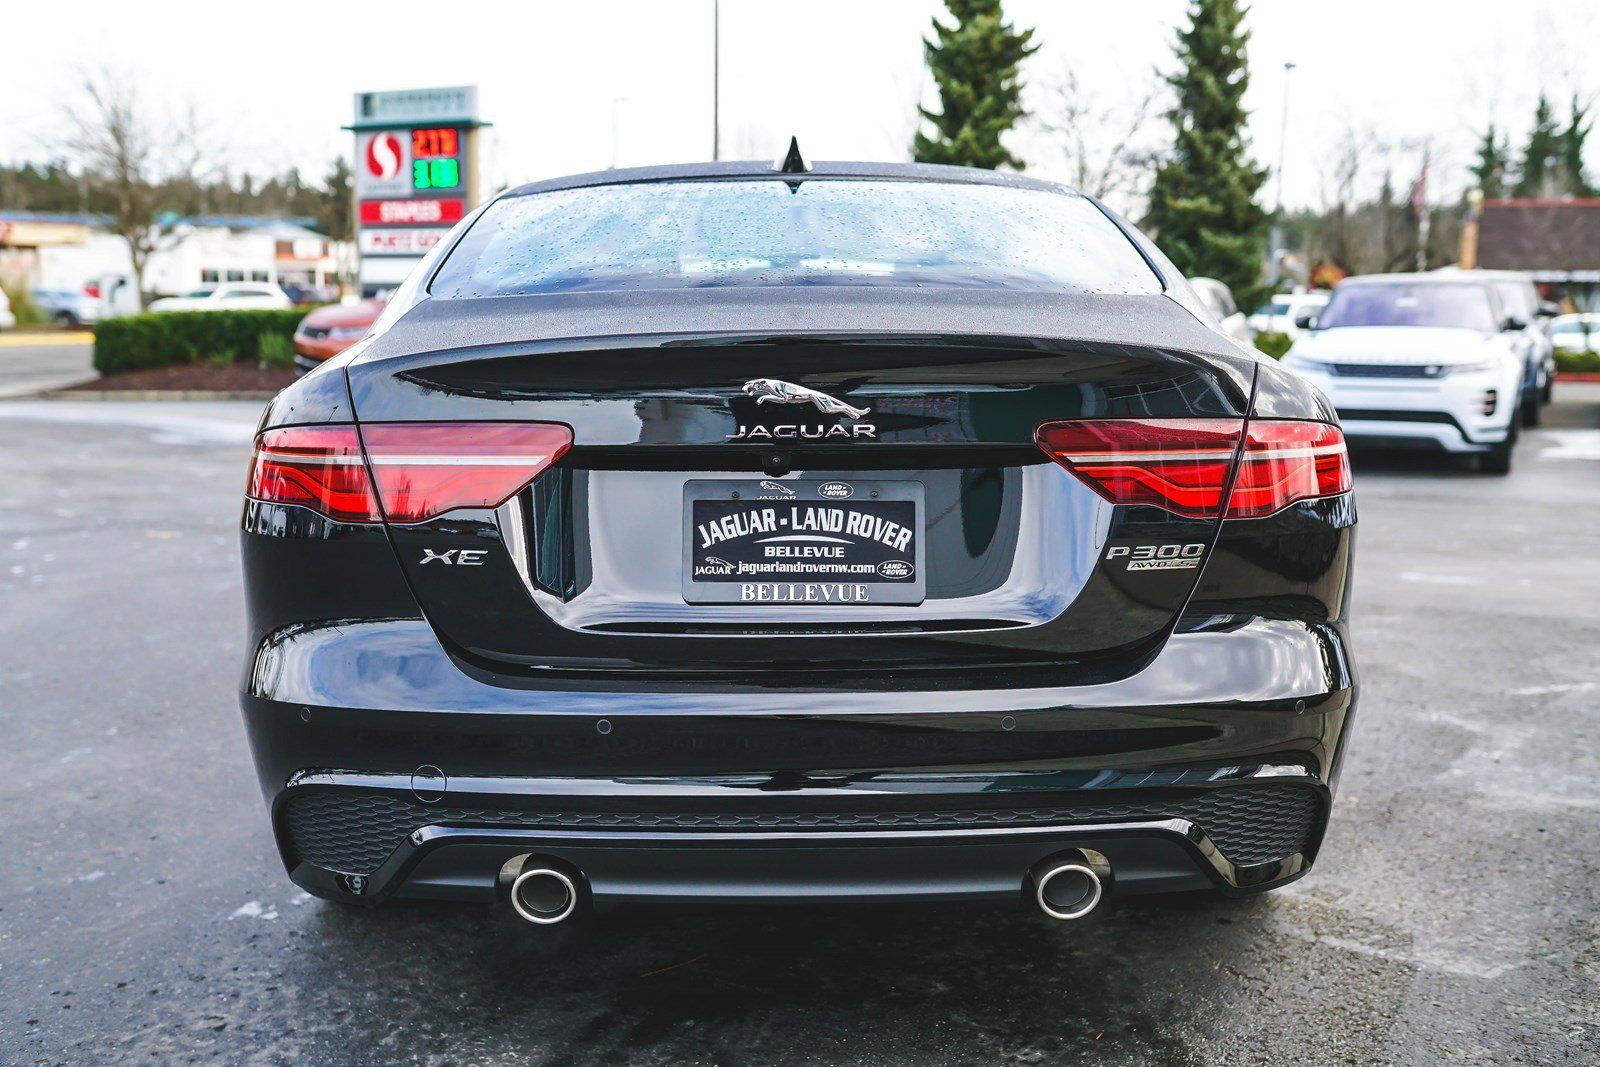 New 2020 Jaguar XE RDynamic S 4dr Car in Bellevue 90890